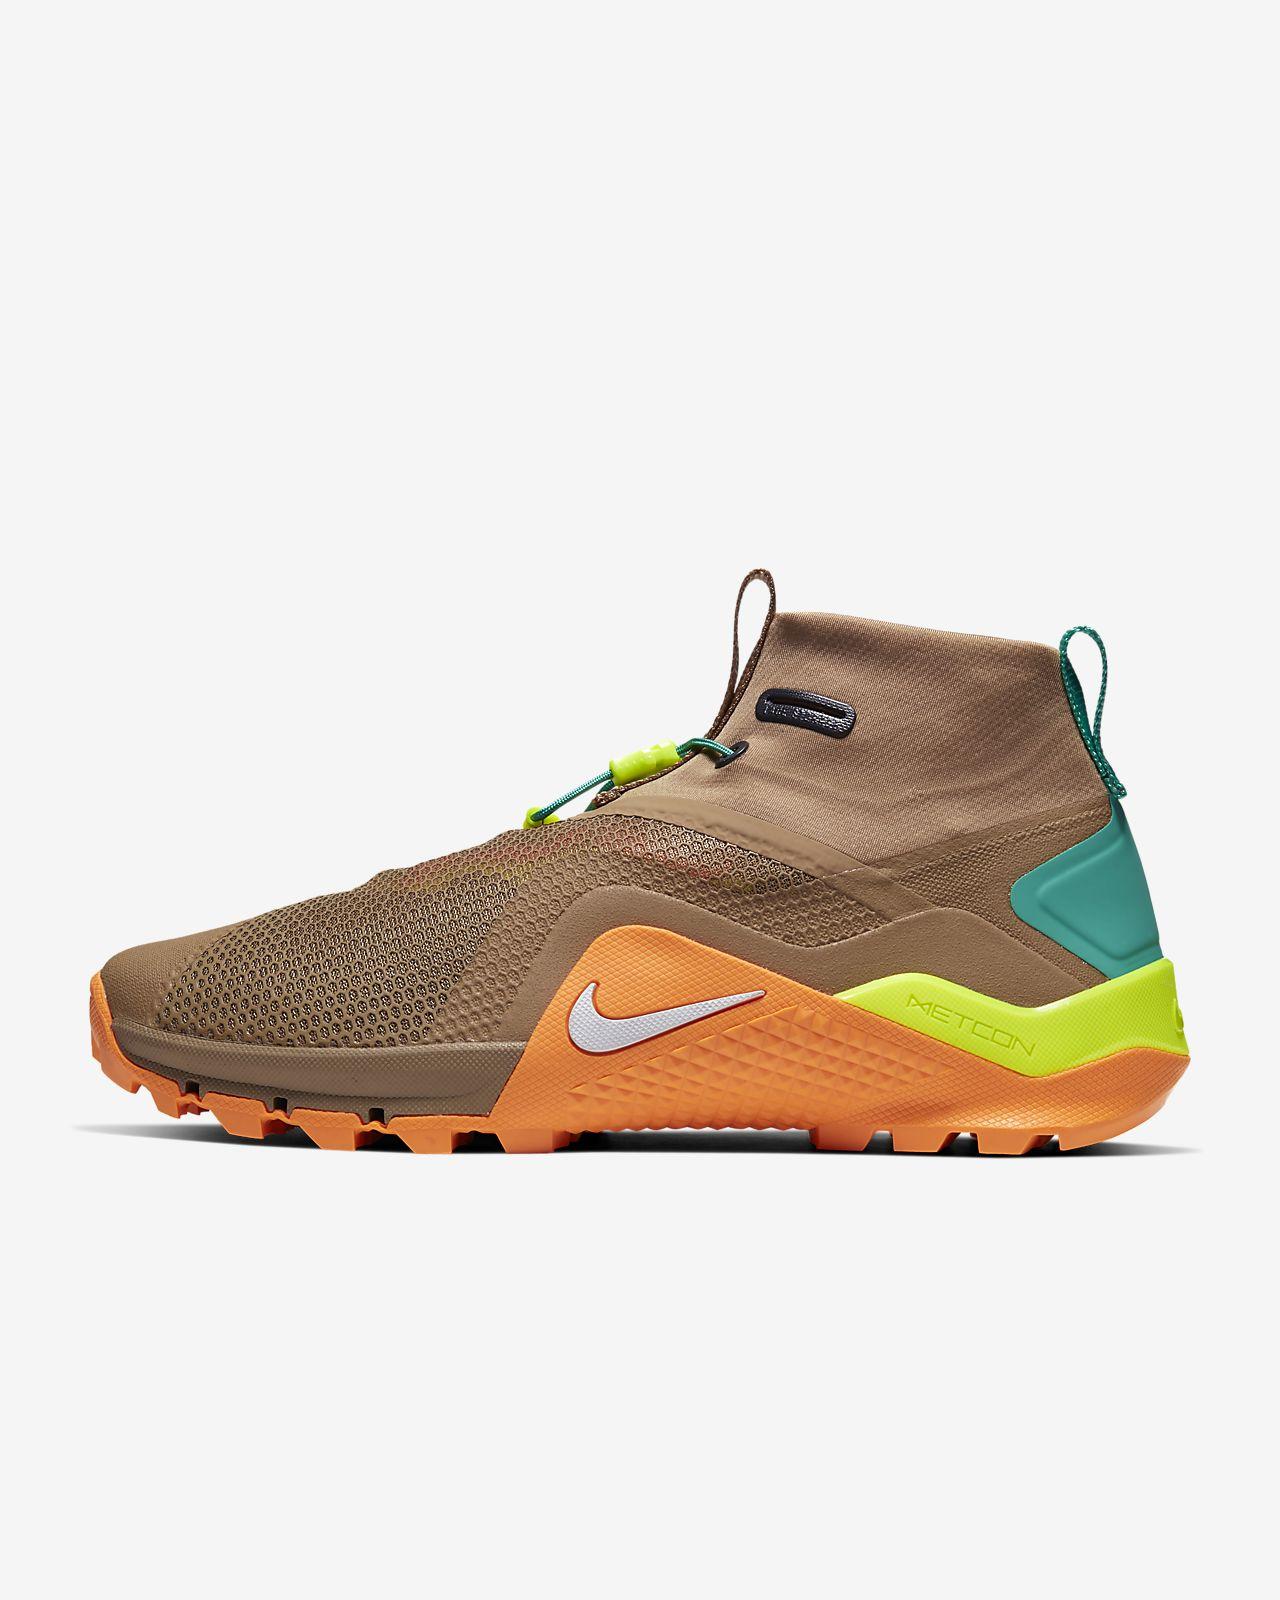 Chaussure de training Nike MetconSF pour Homme